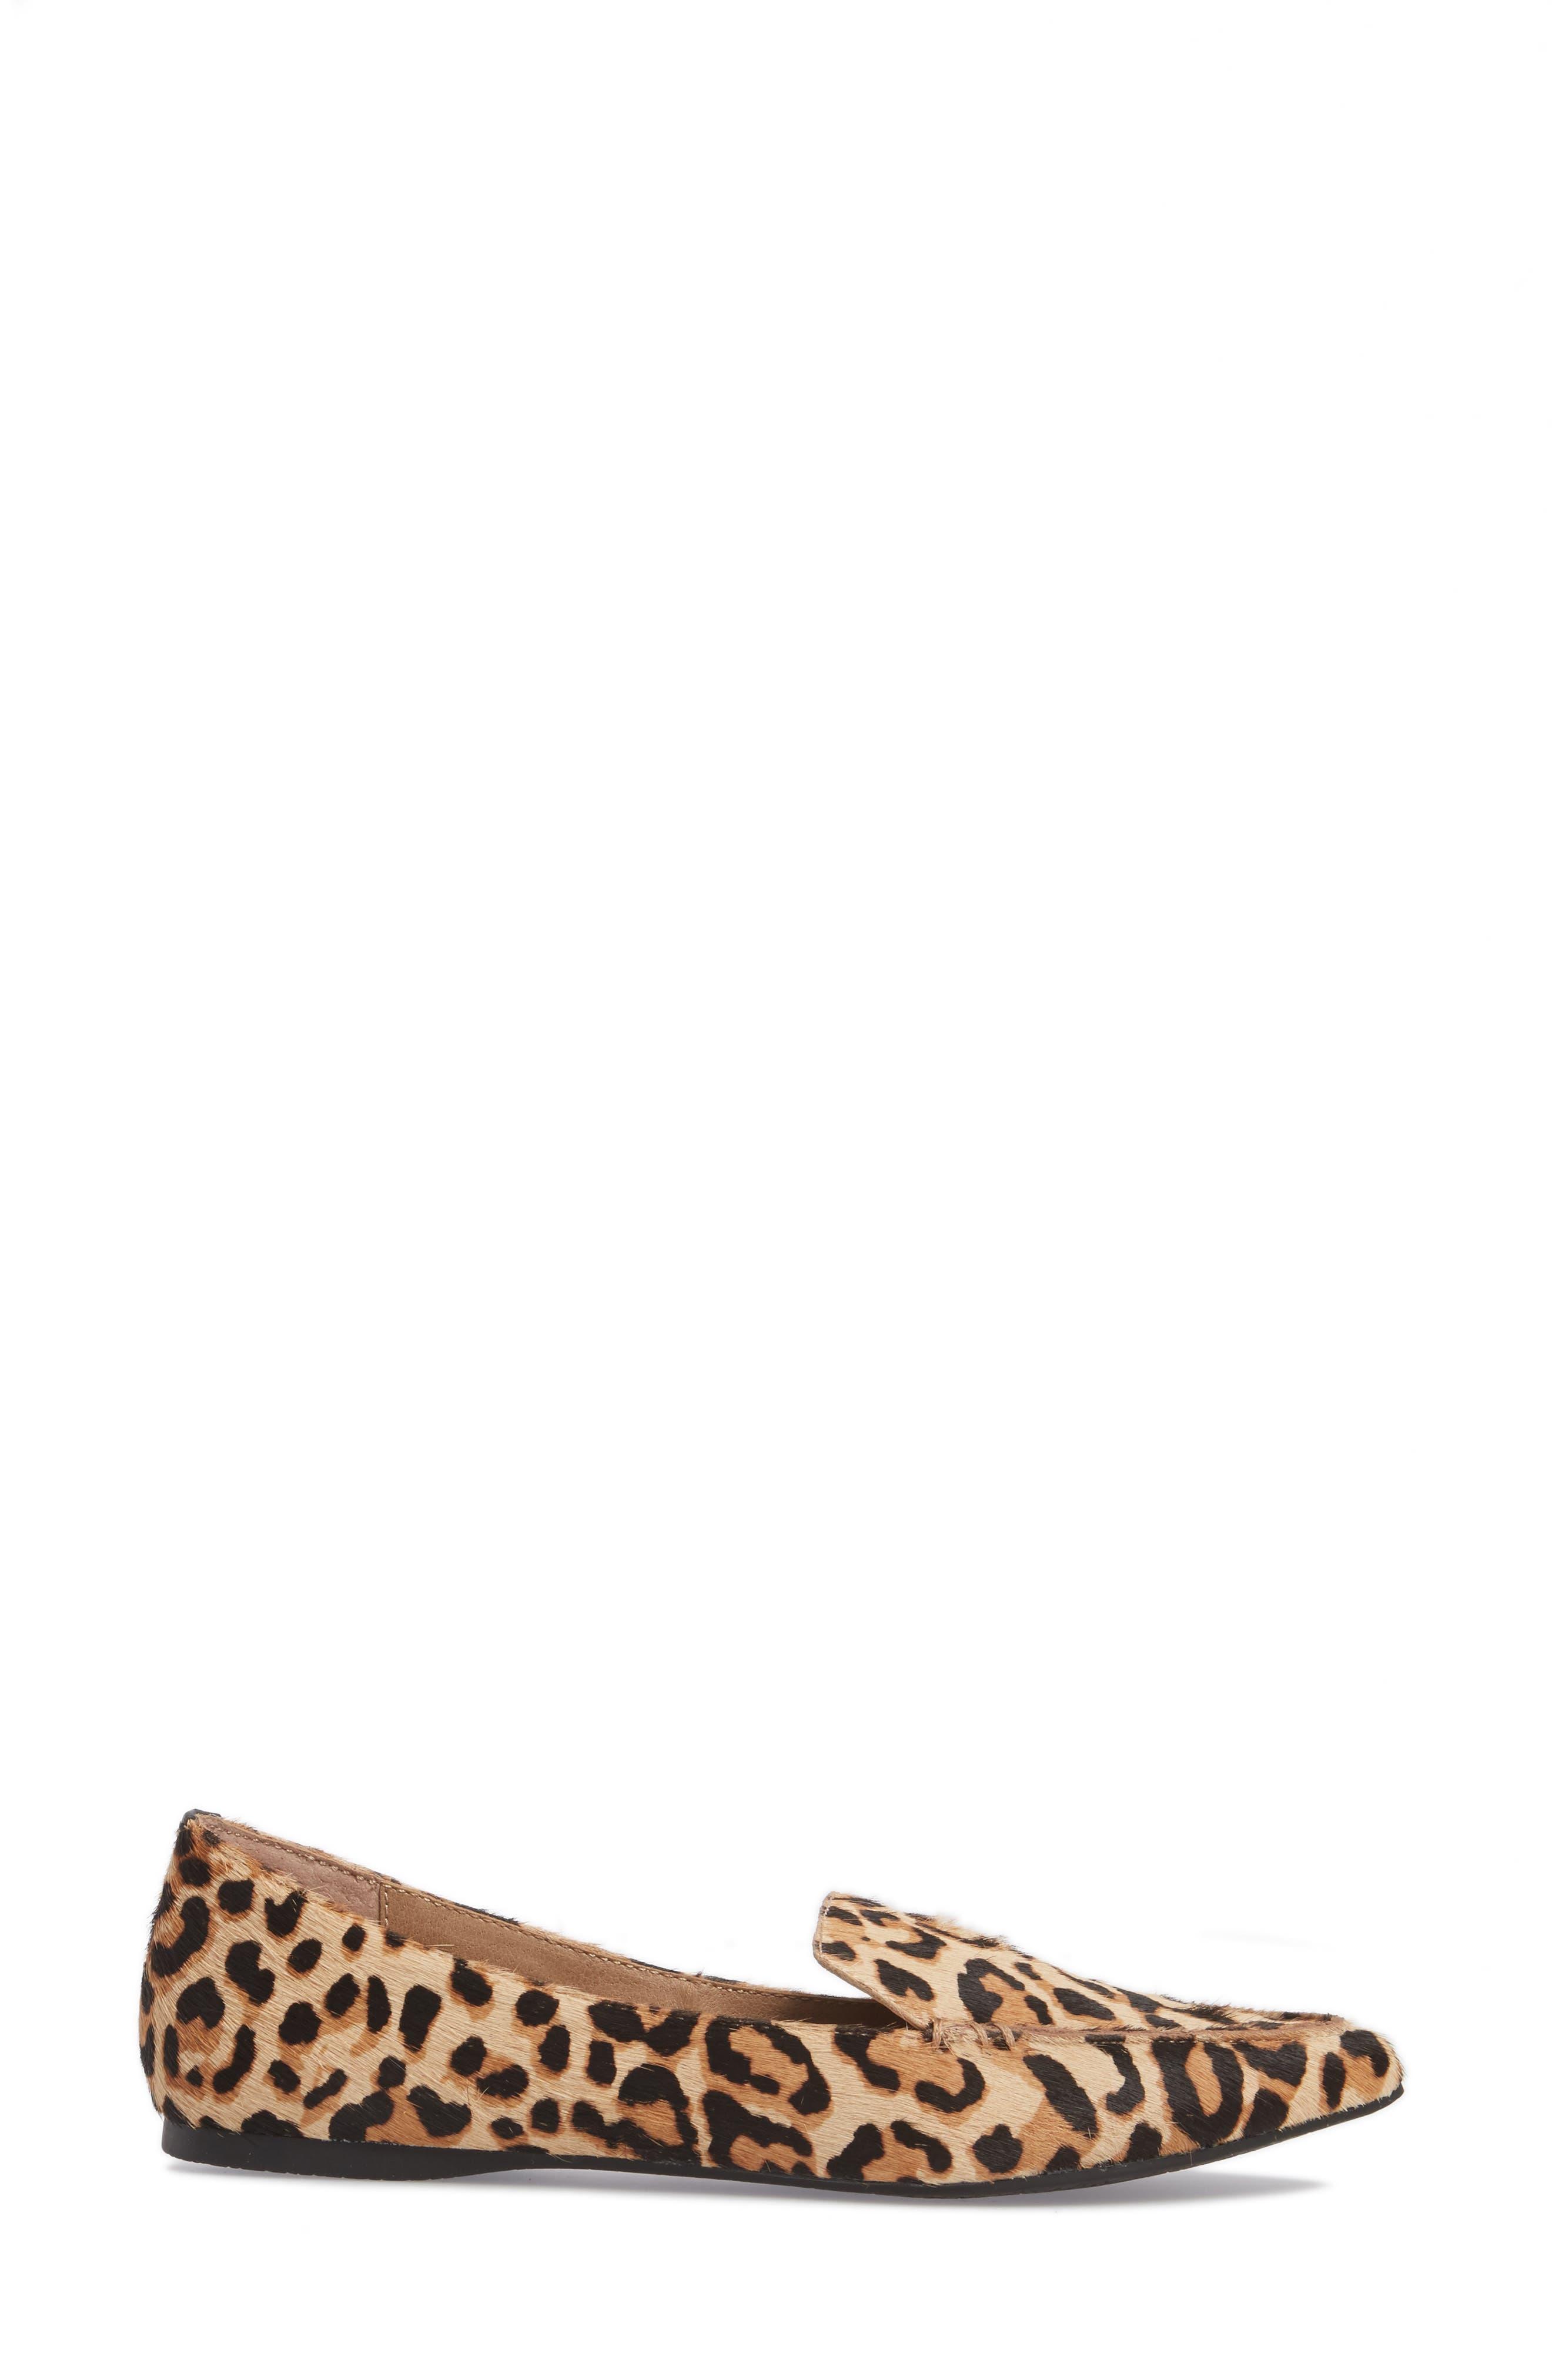 STEVE MADDEN, Feather-L Genuine Calf Hair Loafer Flat, Alternate thumbnail 3, color, LEOPARD